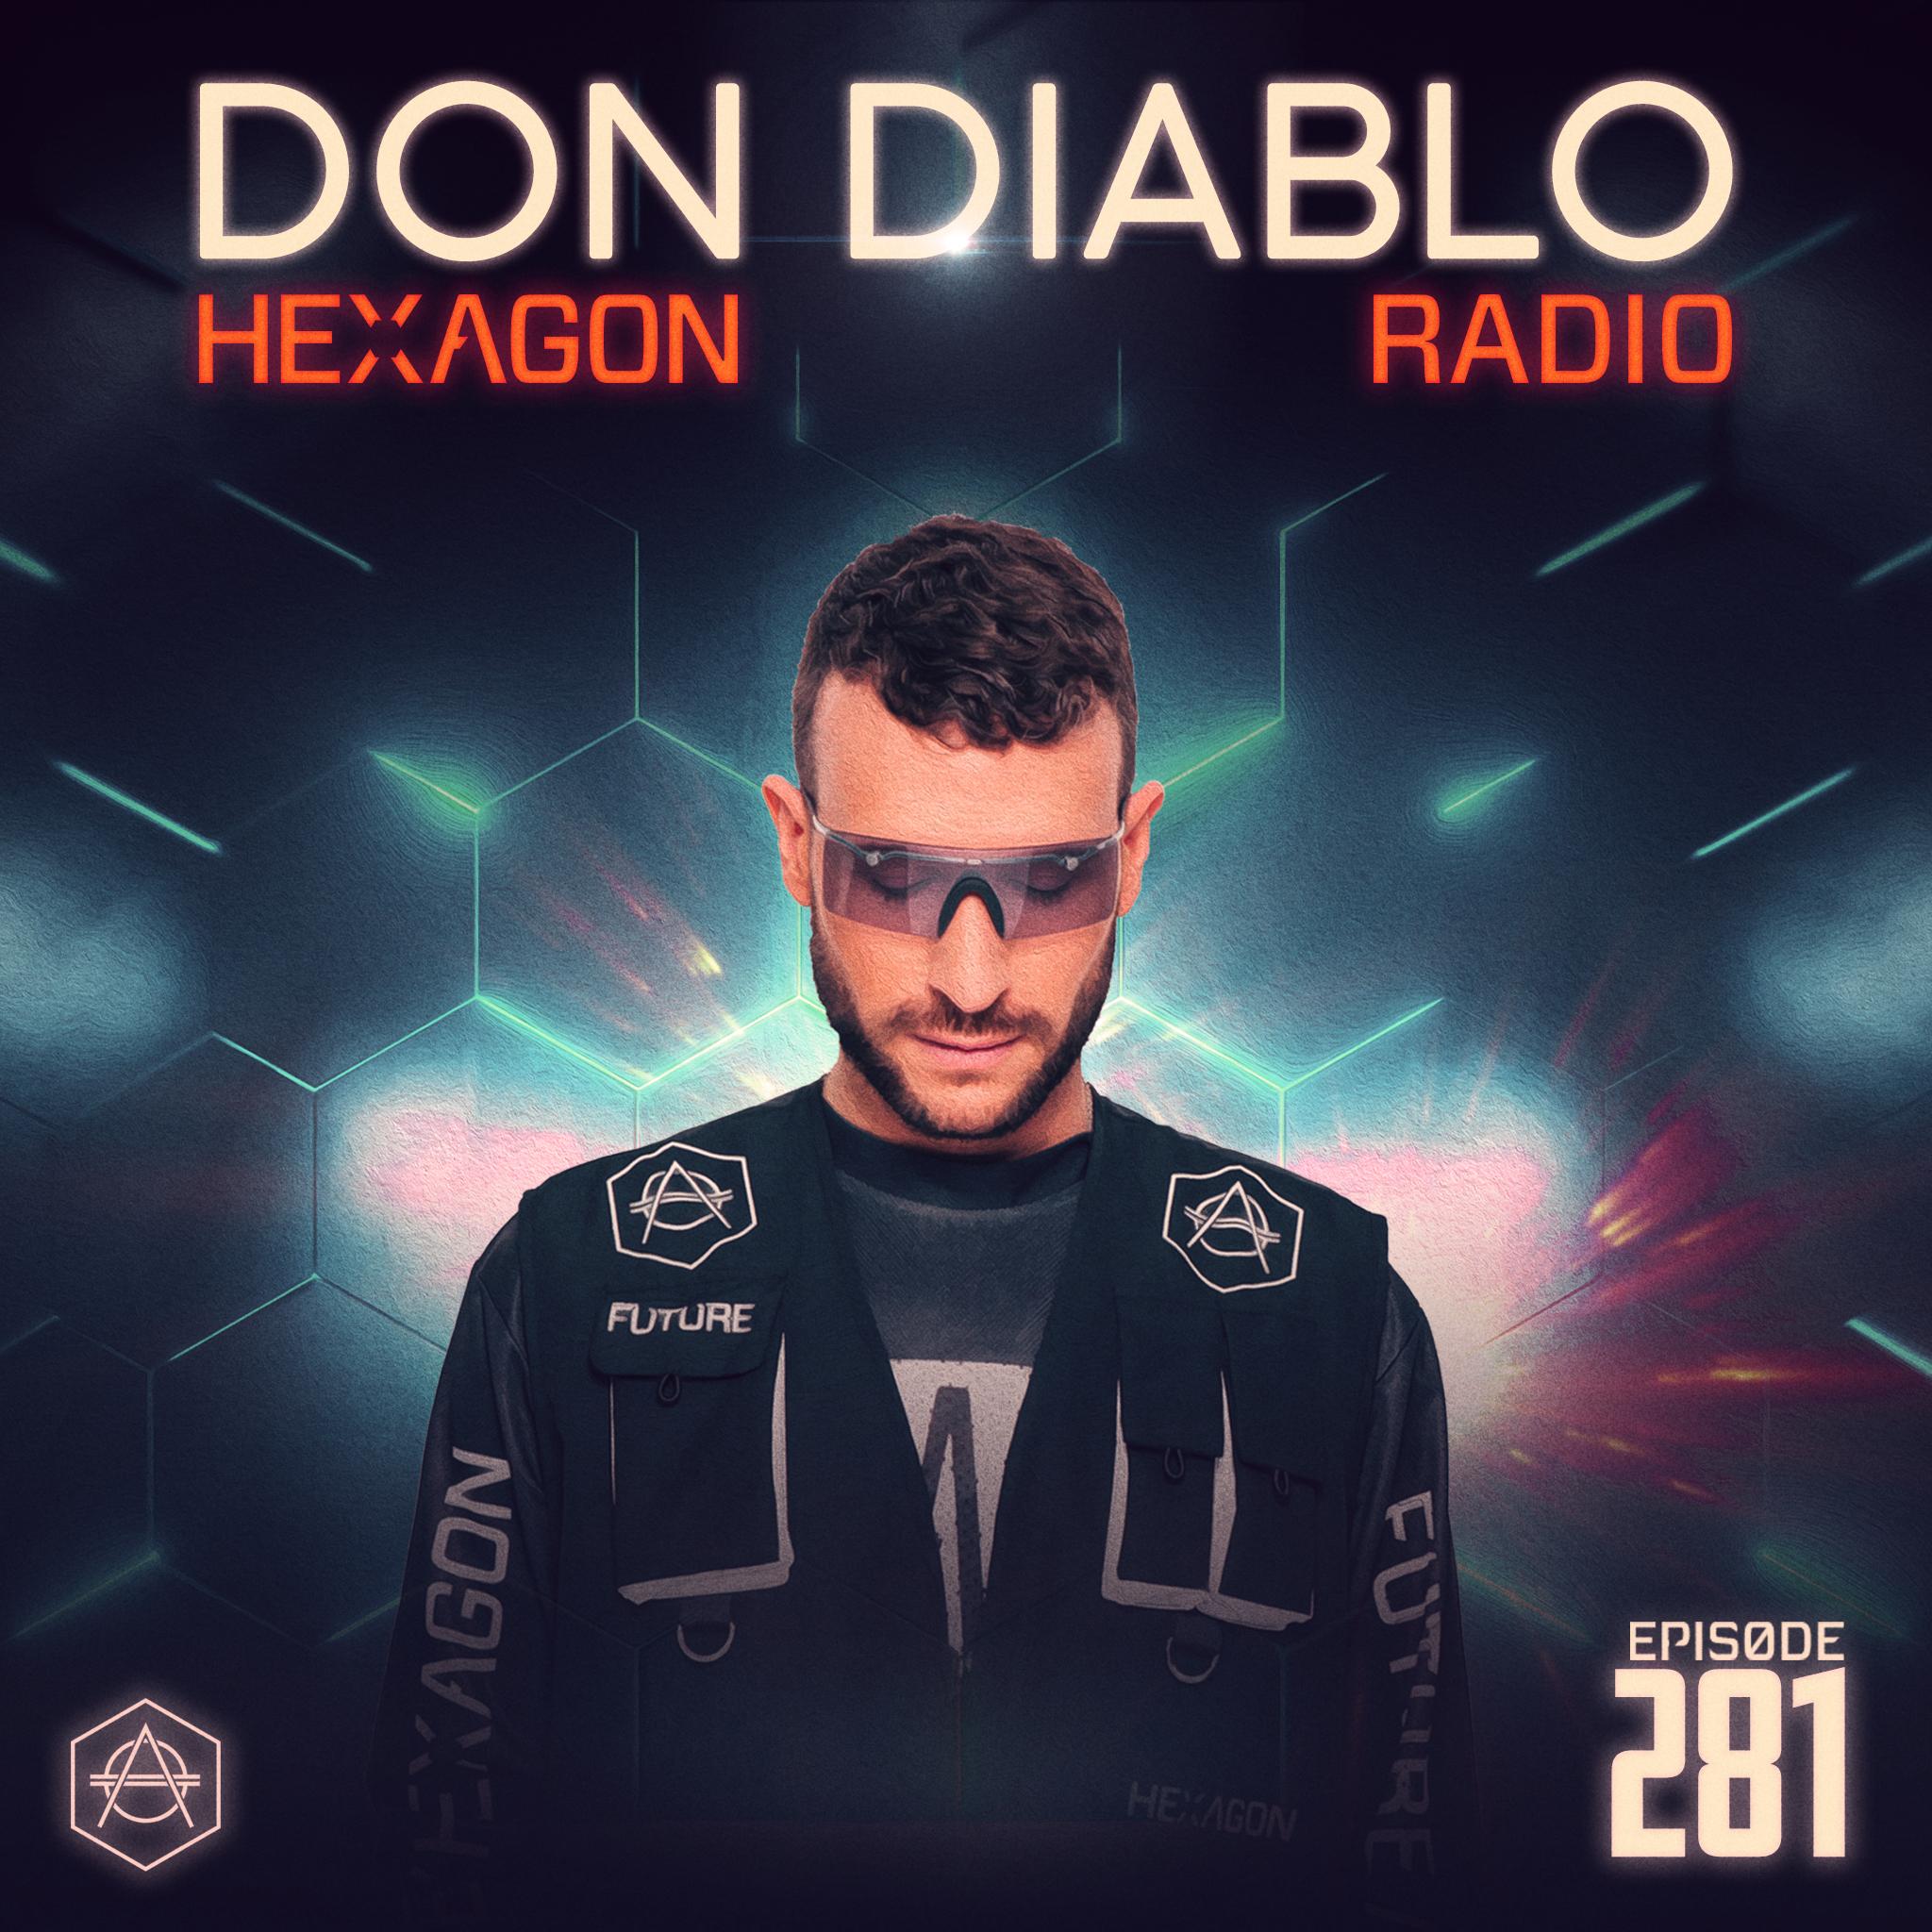 Don Diablo Hexagon Radio Episode 281